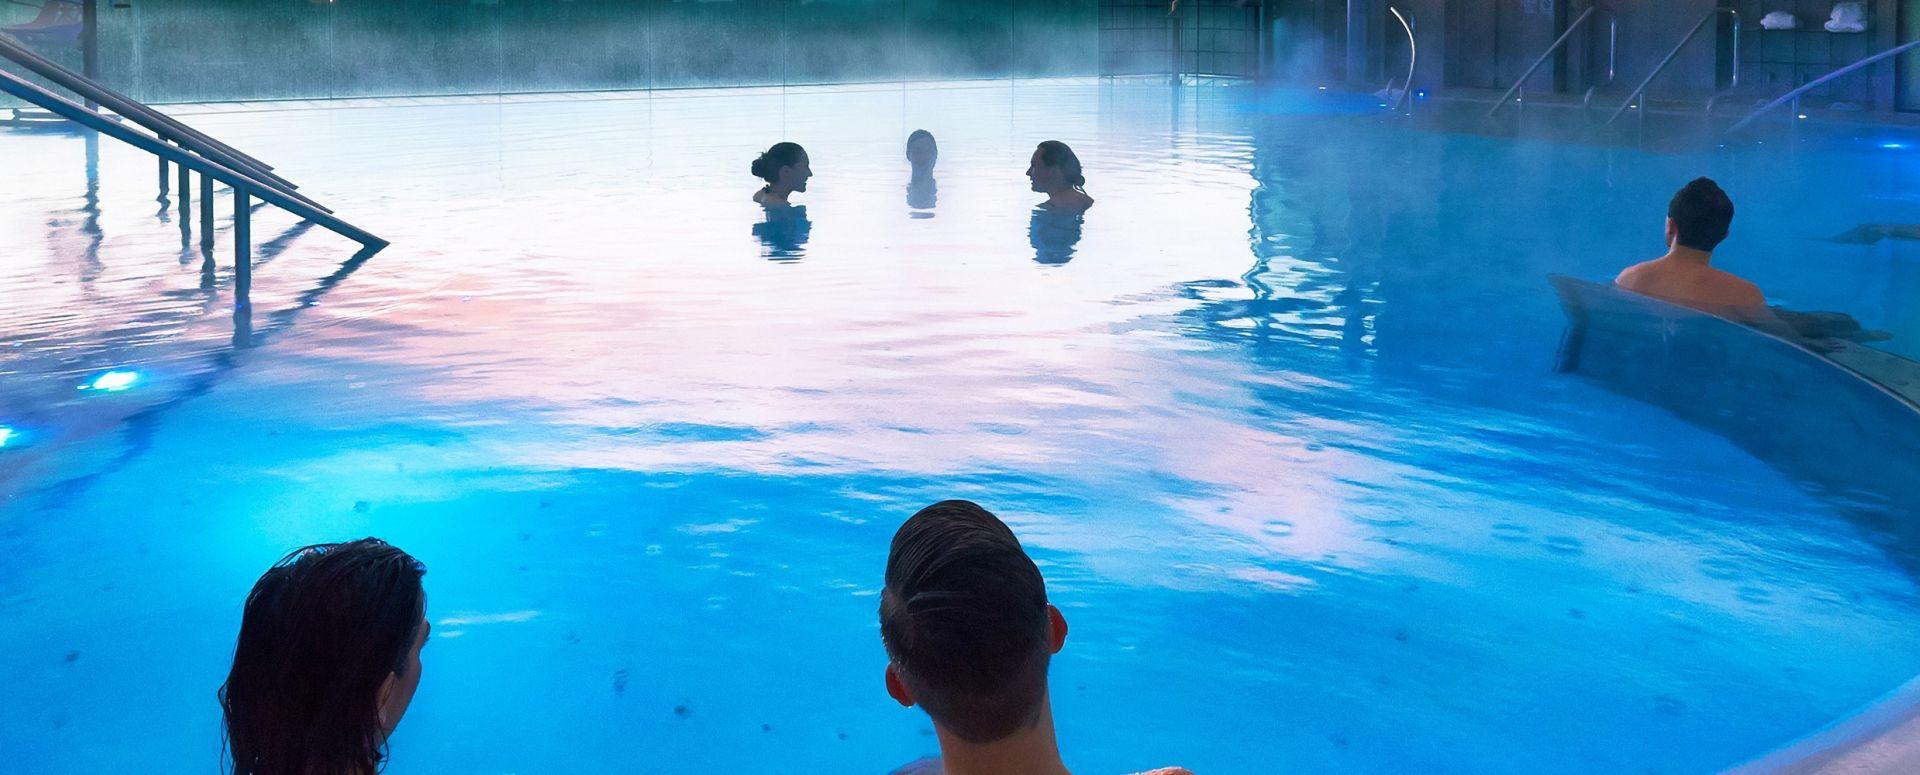 OMGB   Thermae Bath Spa   VisitBritain